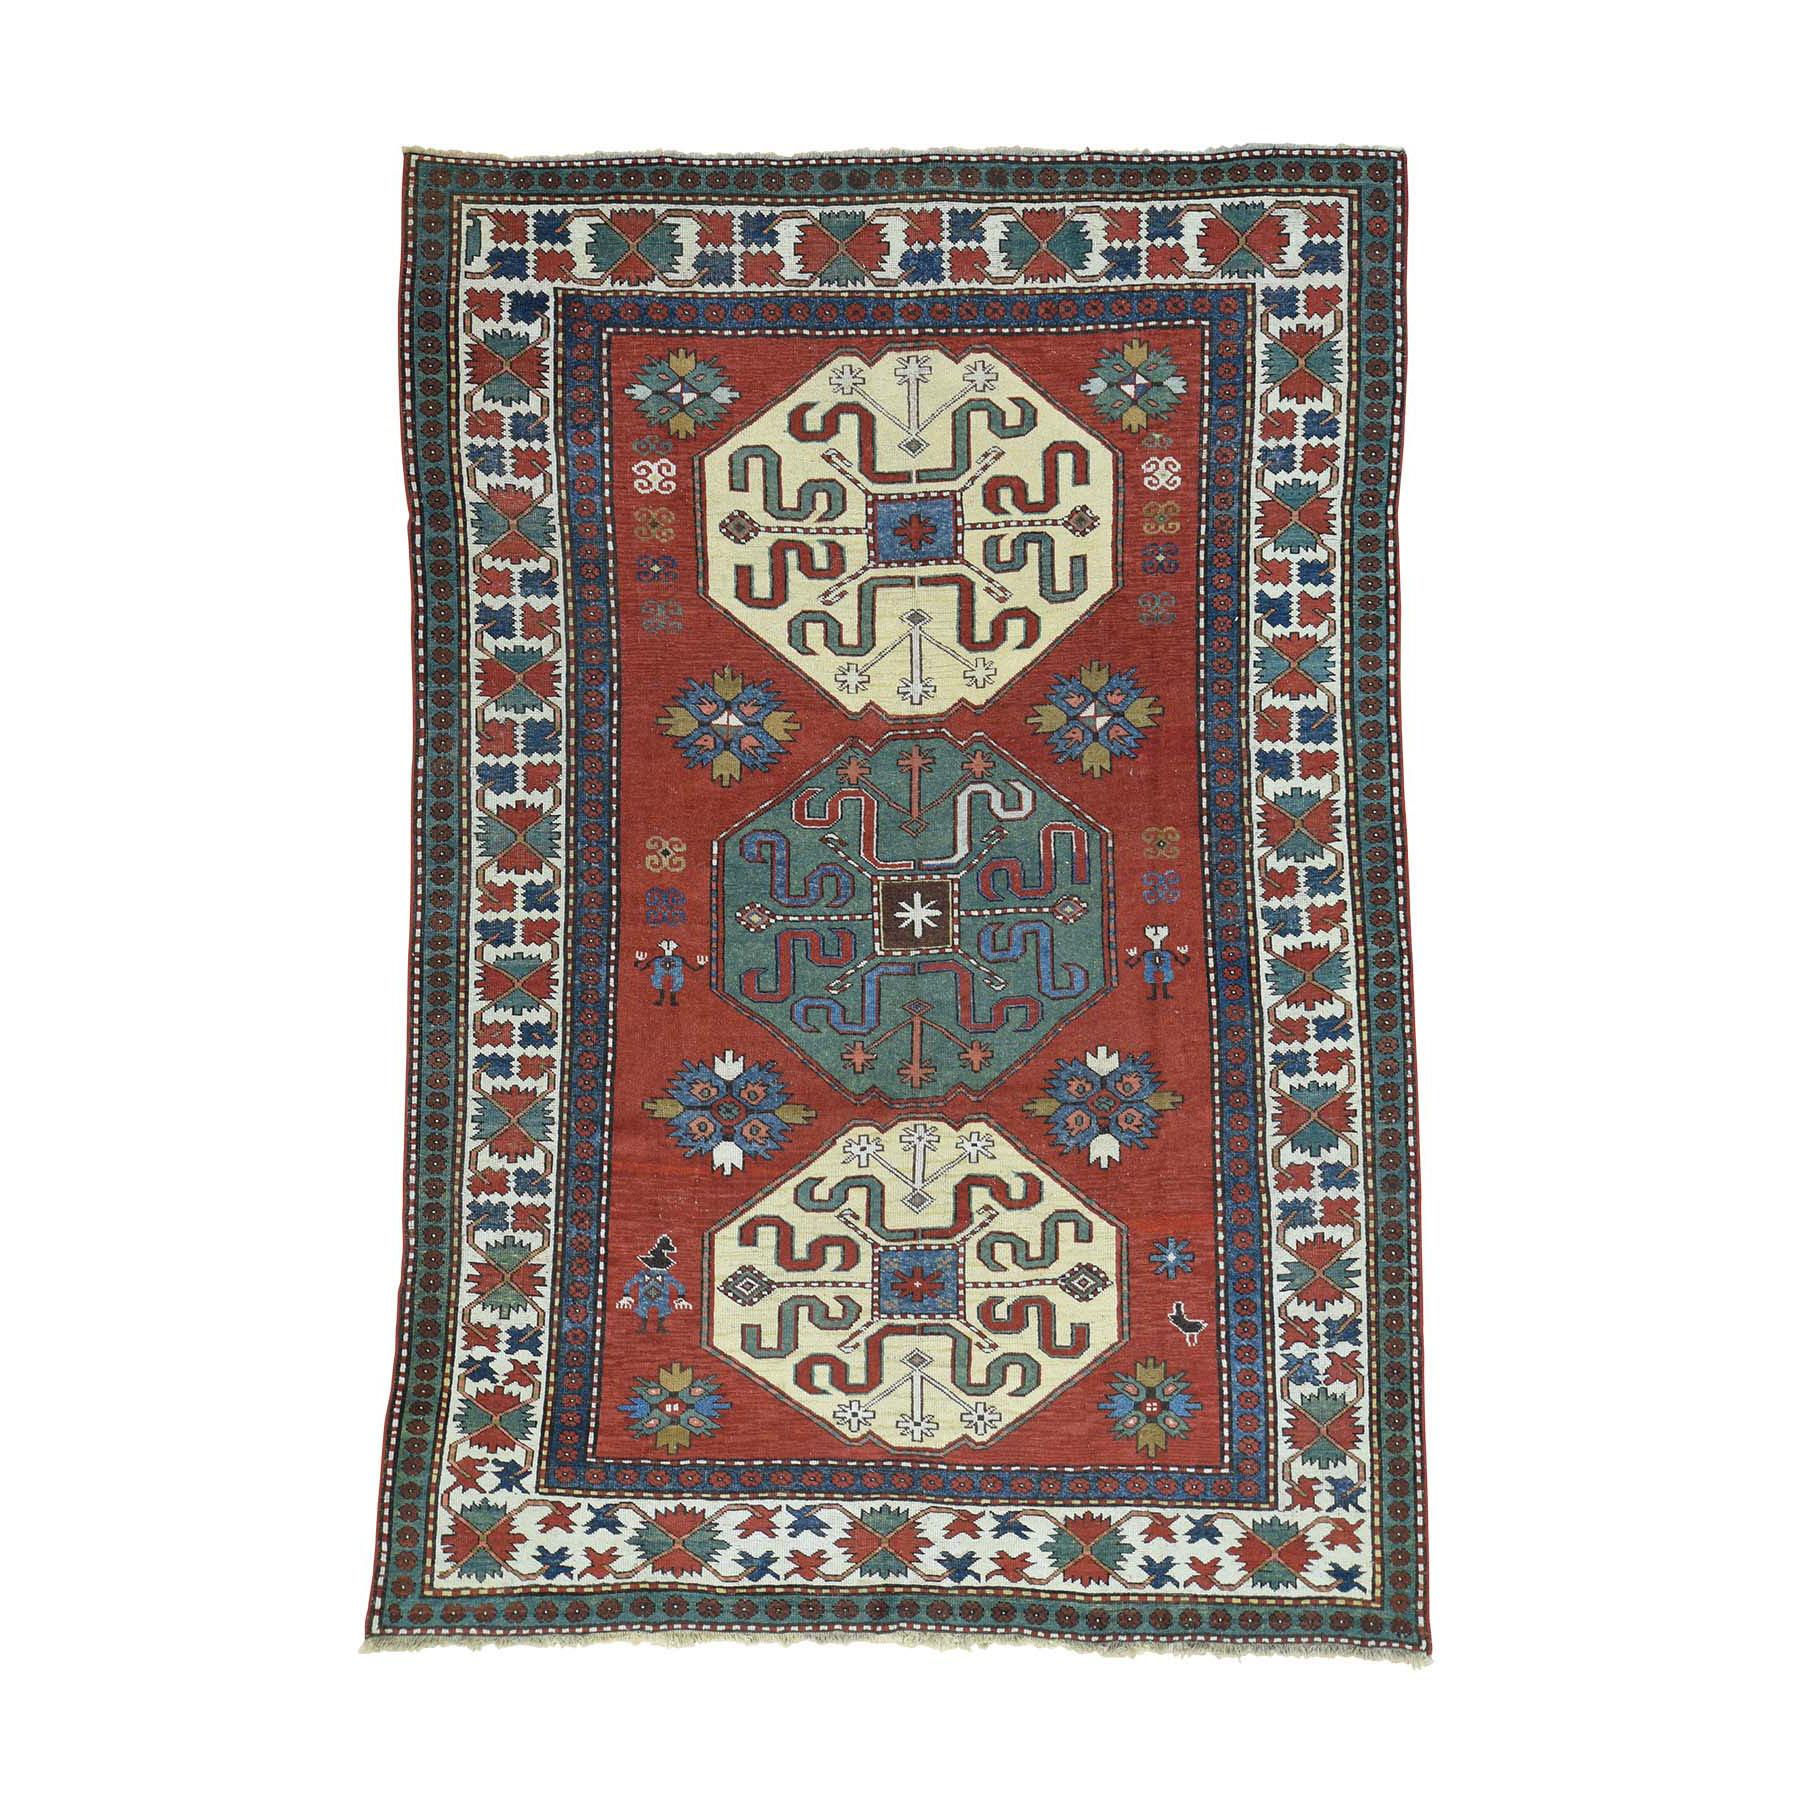 "6'X8'9"" Antique Kazak Exc Cond 100 Percent Wool Oriental Rug moacb0b6"